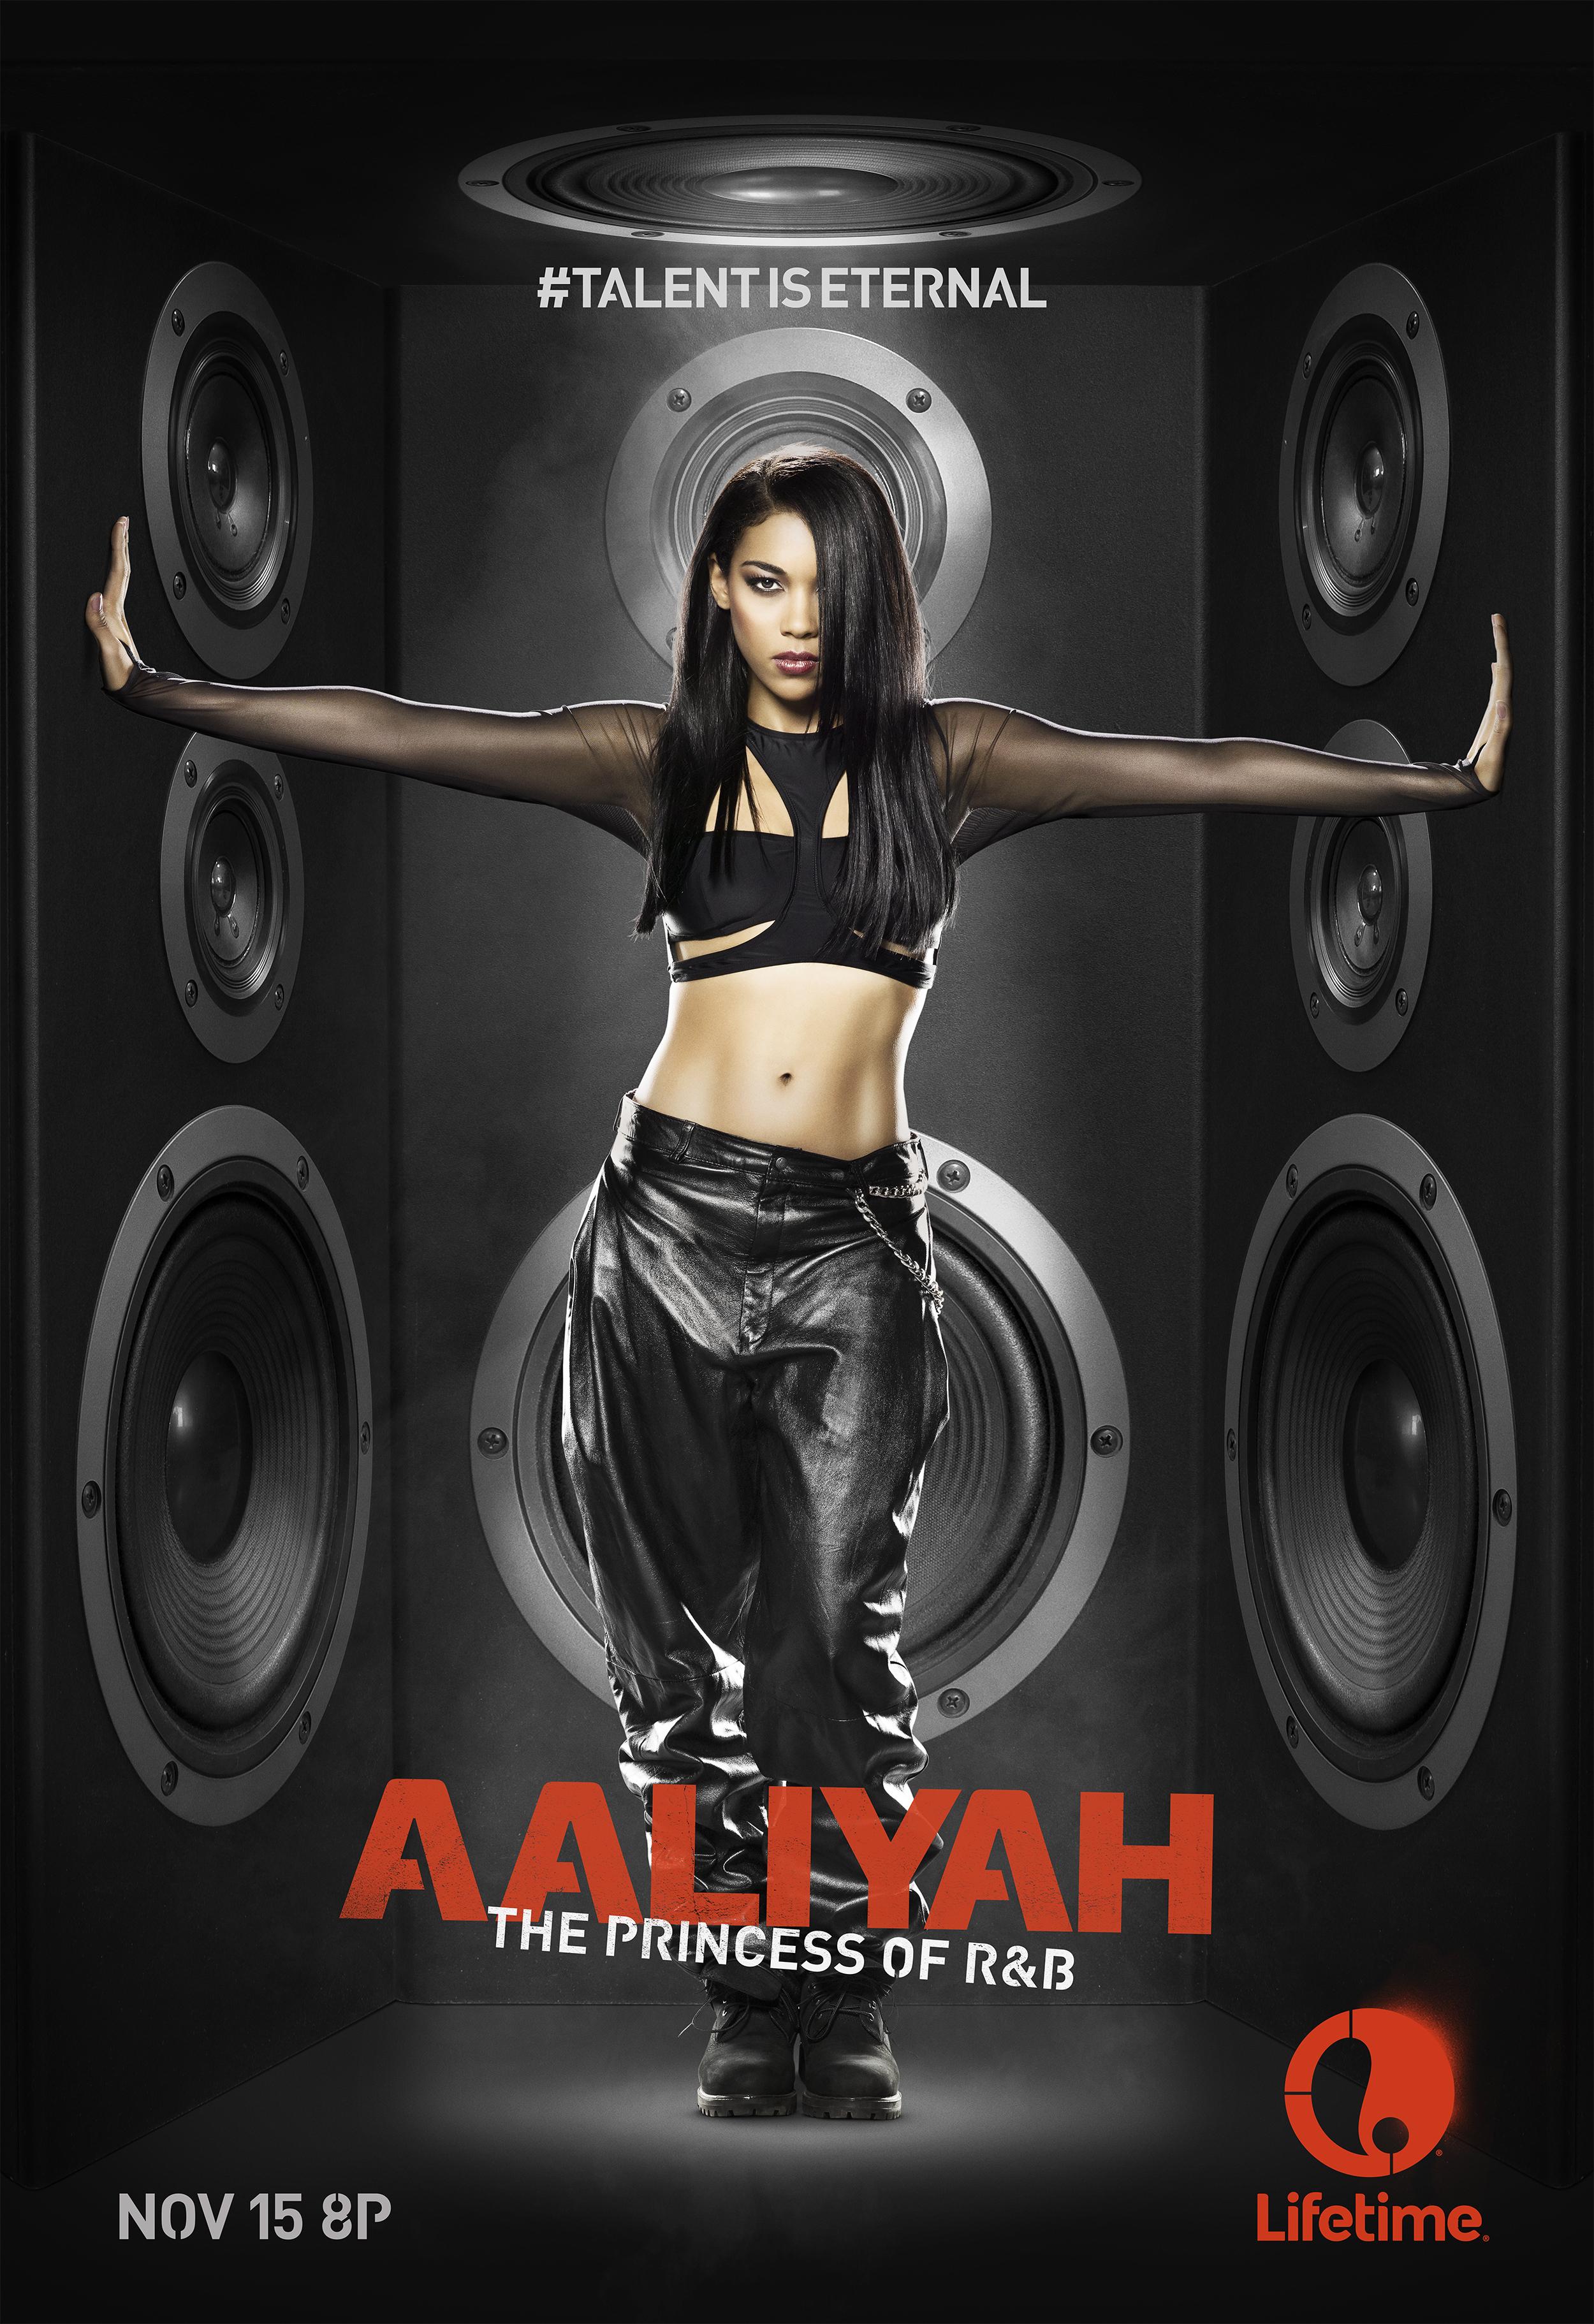 aaliyah_speakers_finish